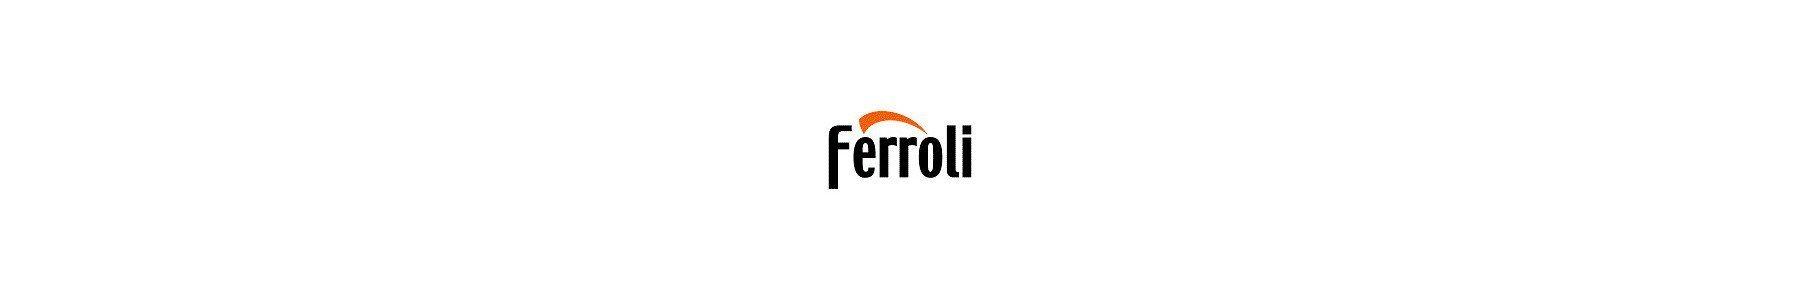 repuestos  ferroli